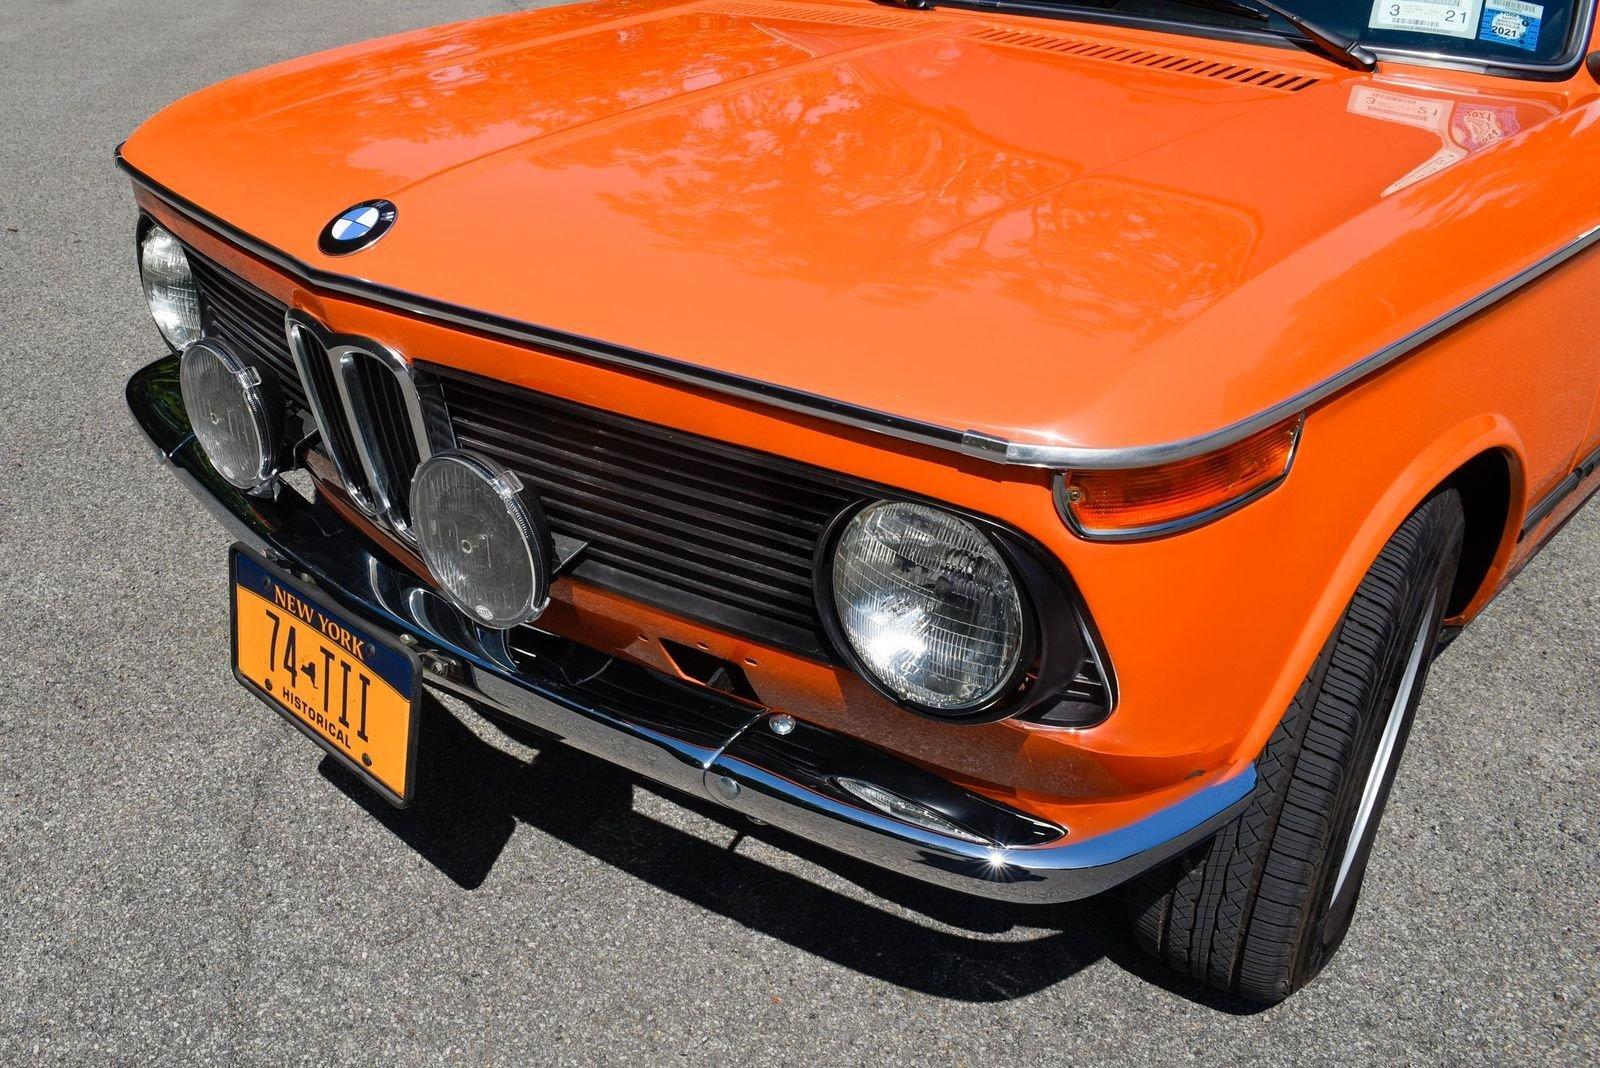 1974 Bmw 2002tii Saratoga Auto Auction